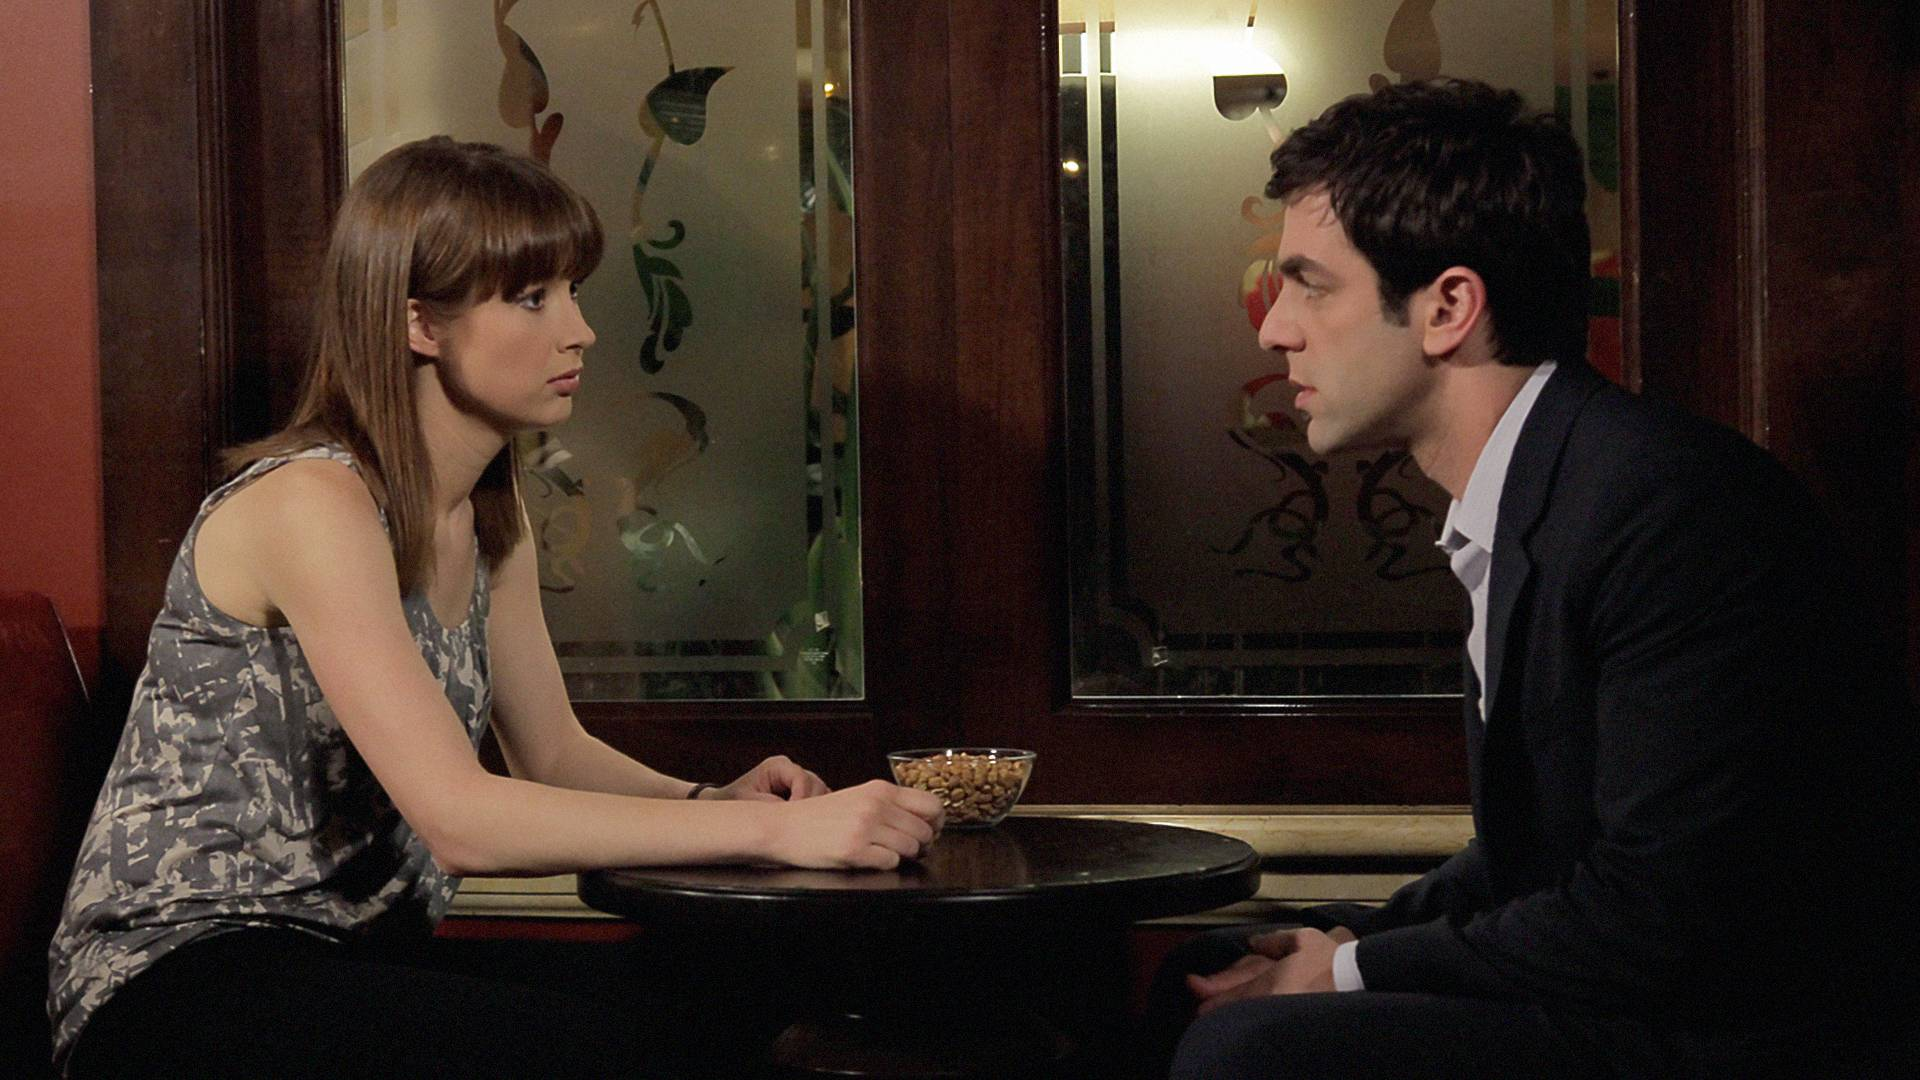 The Office Season 8 Episode 16